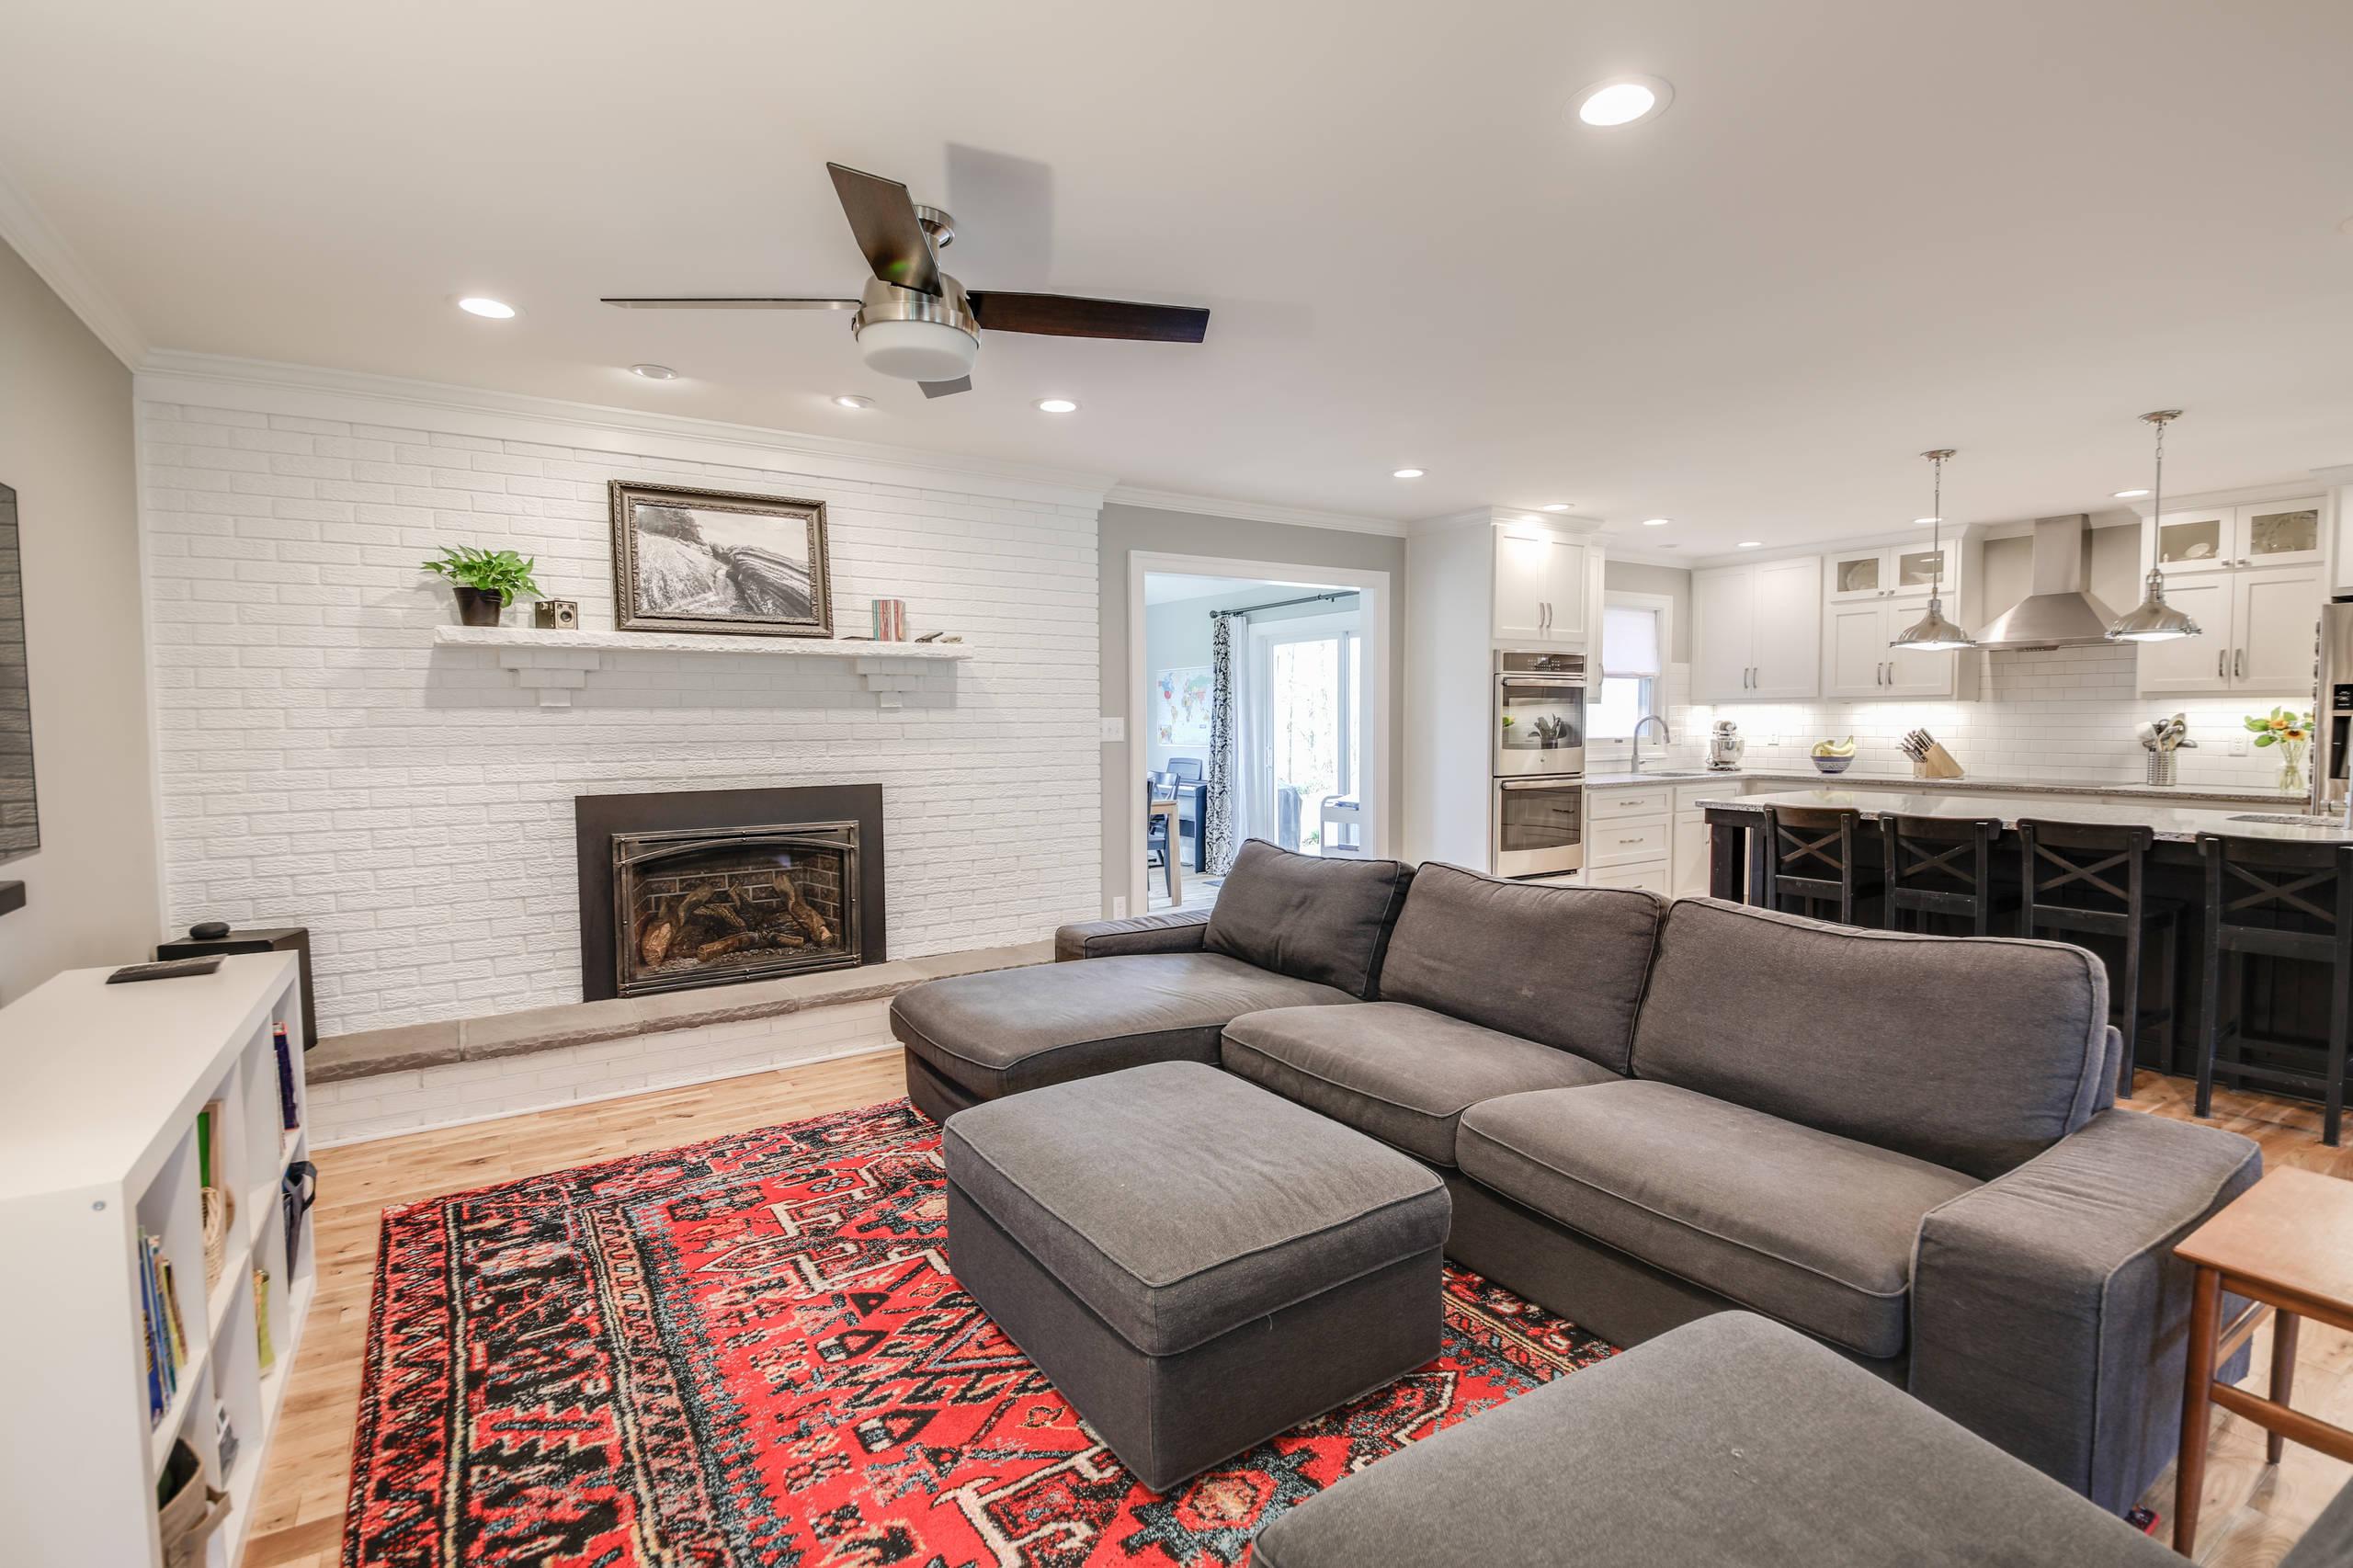 Cheat Lake: Living Room and Kitchen Renovation